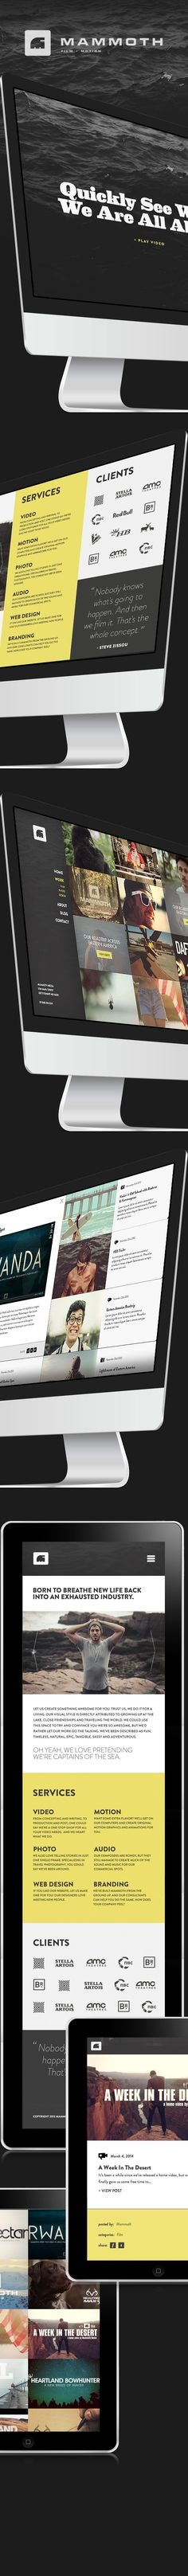 Mammoth Media Redesign on Behance